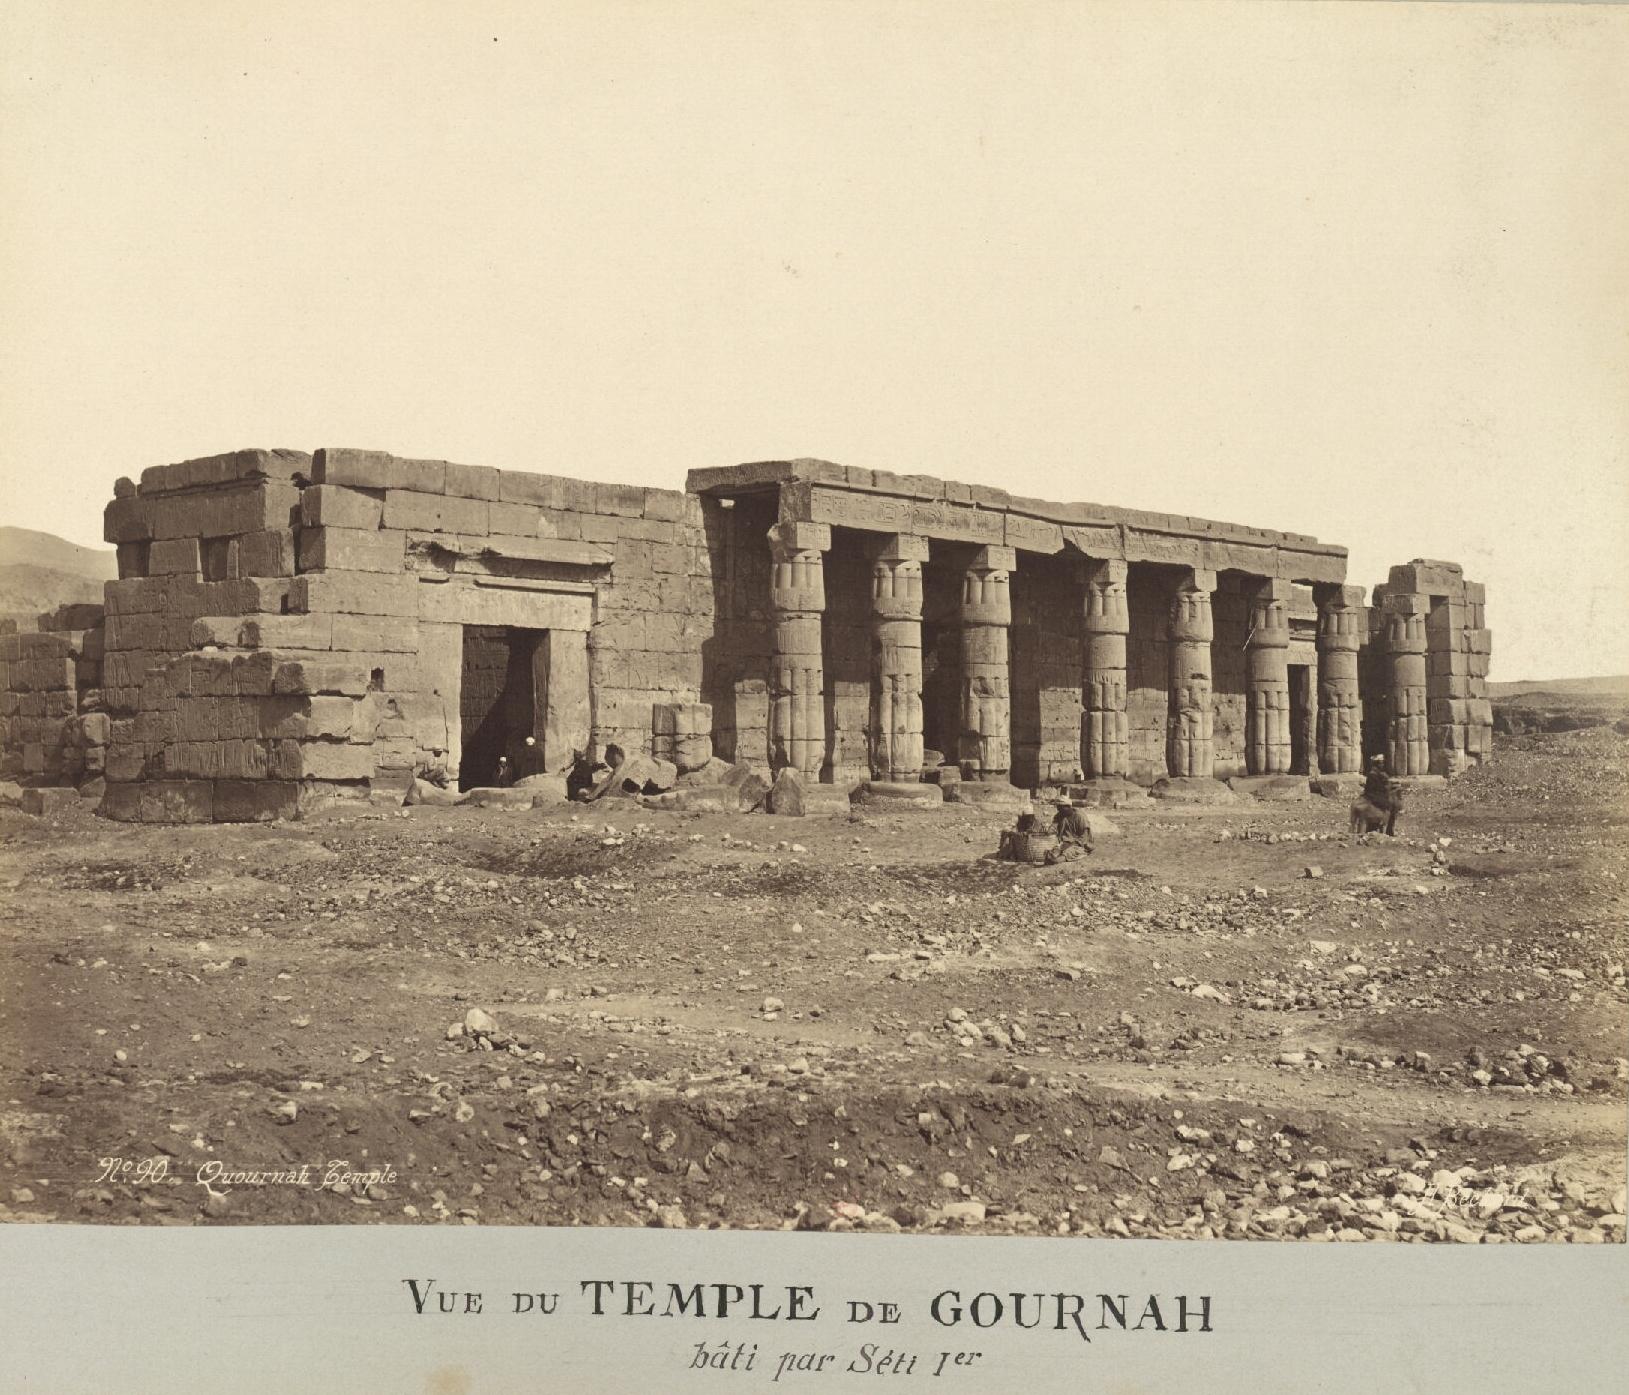 Шейх Абд эль-Курна. Вид на храм, построенный Сети I